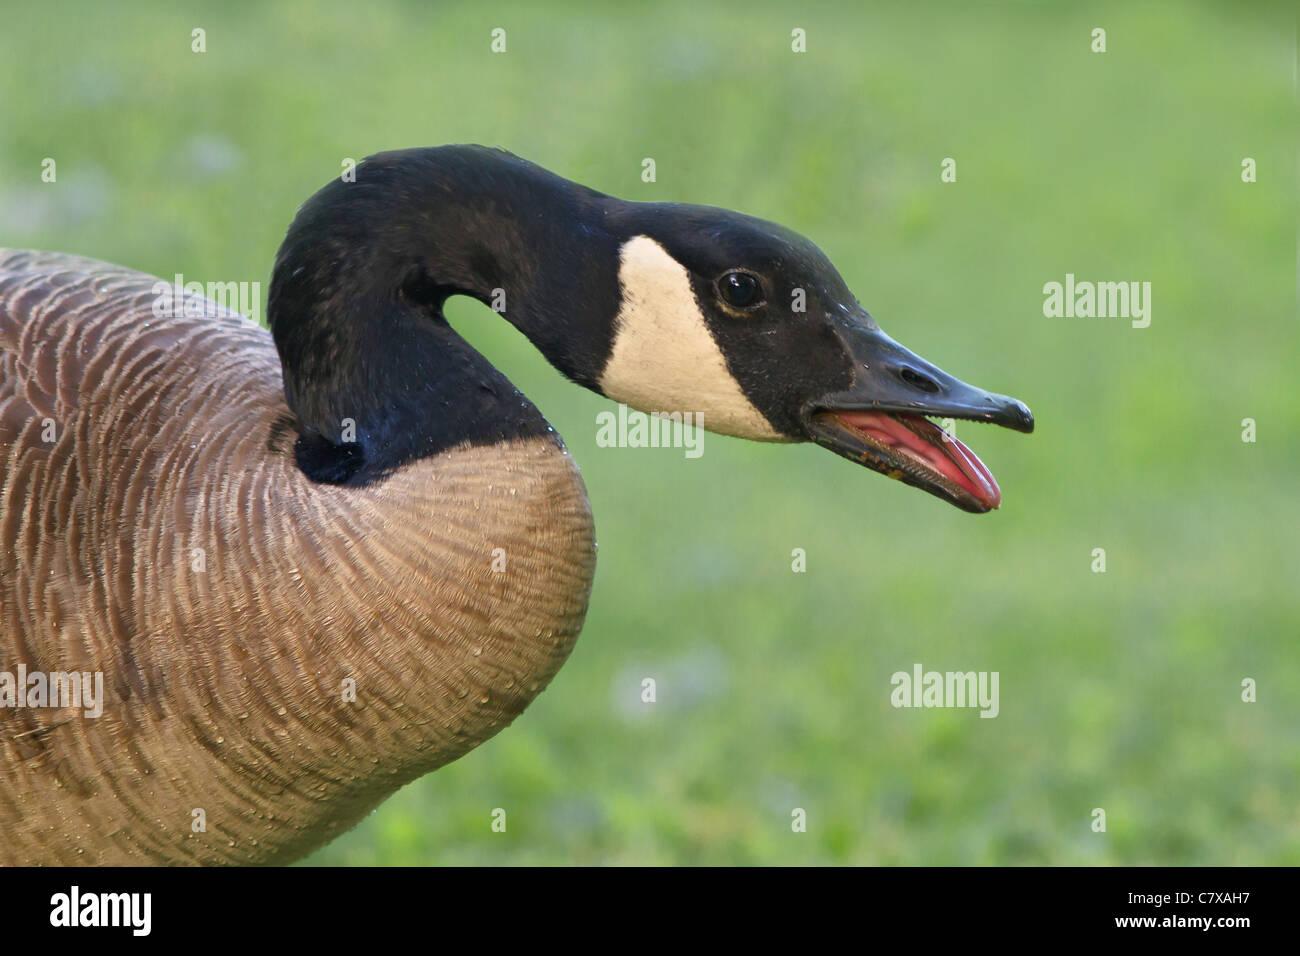 Honking Canada Goose - Stock Image